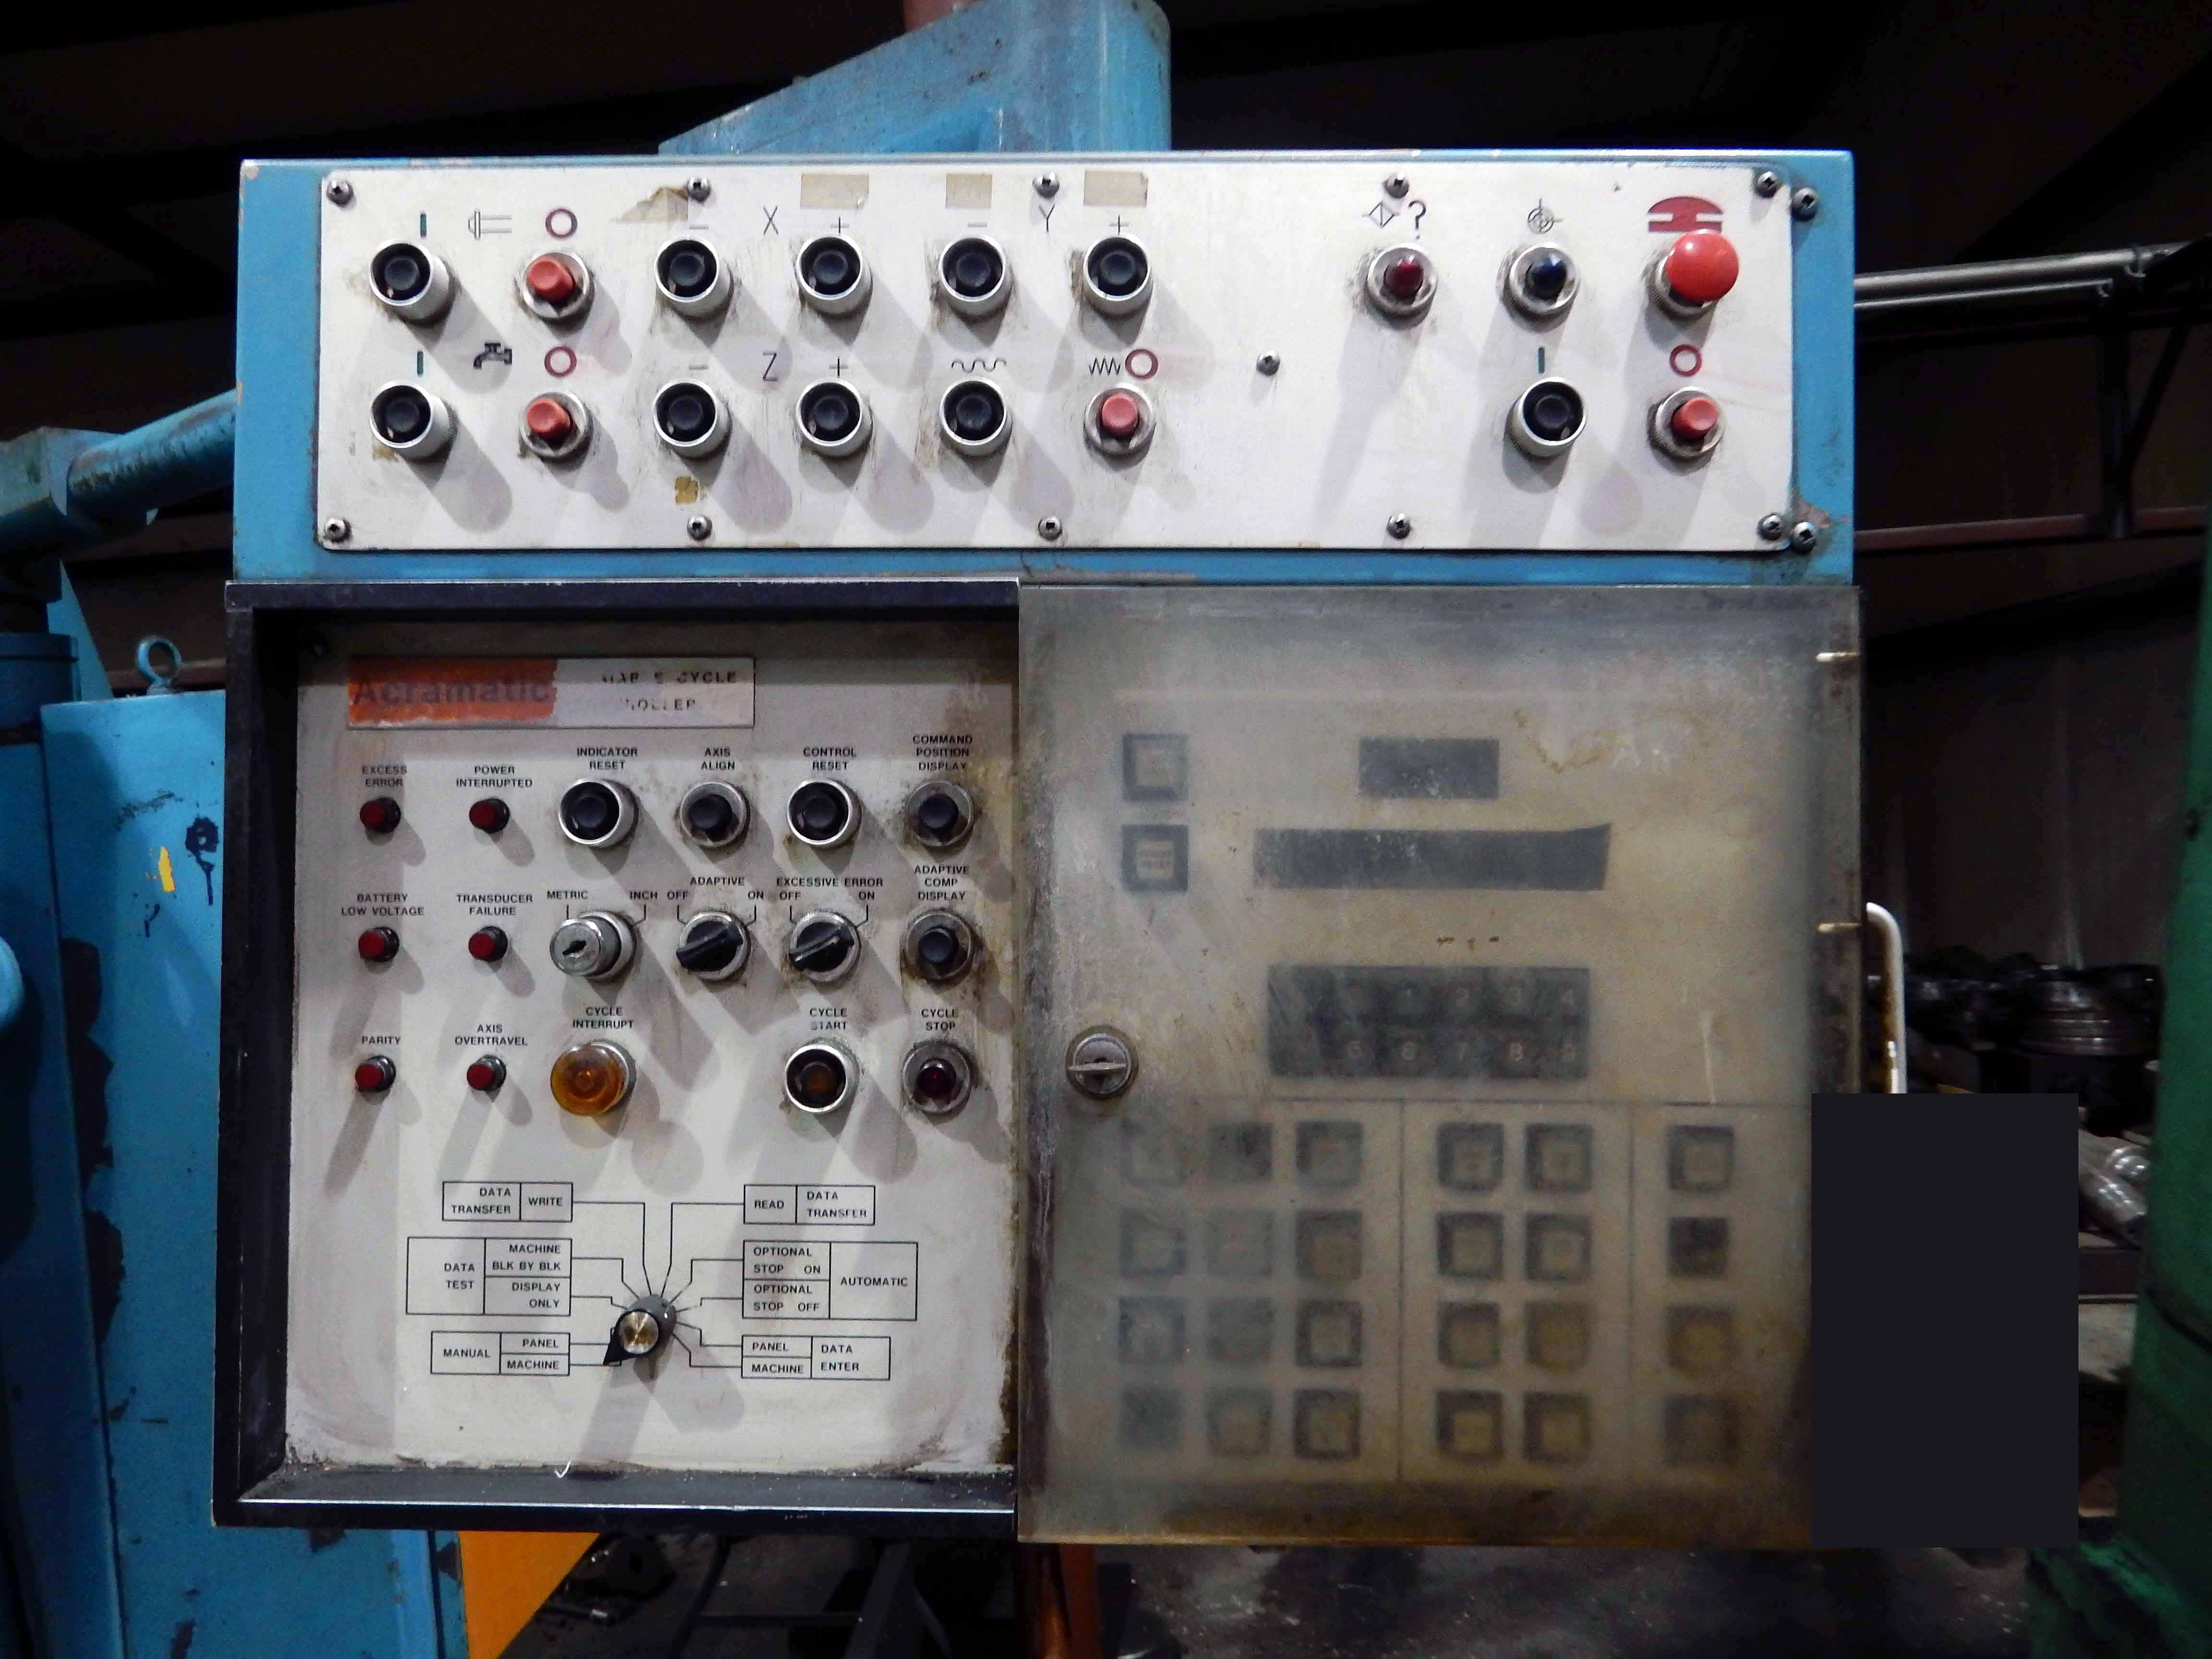 "Lot 49A - VERTICAL MILL, CINCINNATI MILACRON, Cincinnati Accra-Matic push button controls, 16"" x 80"" table,"